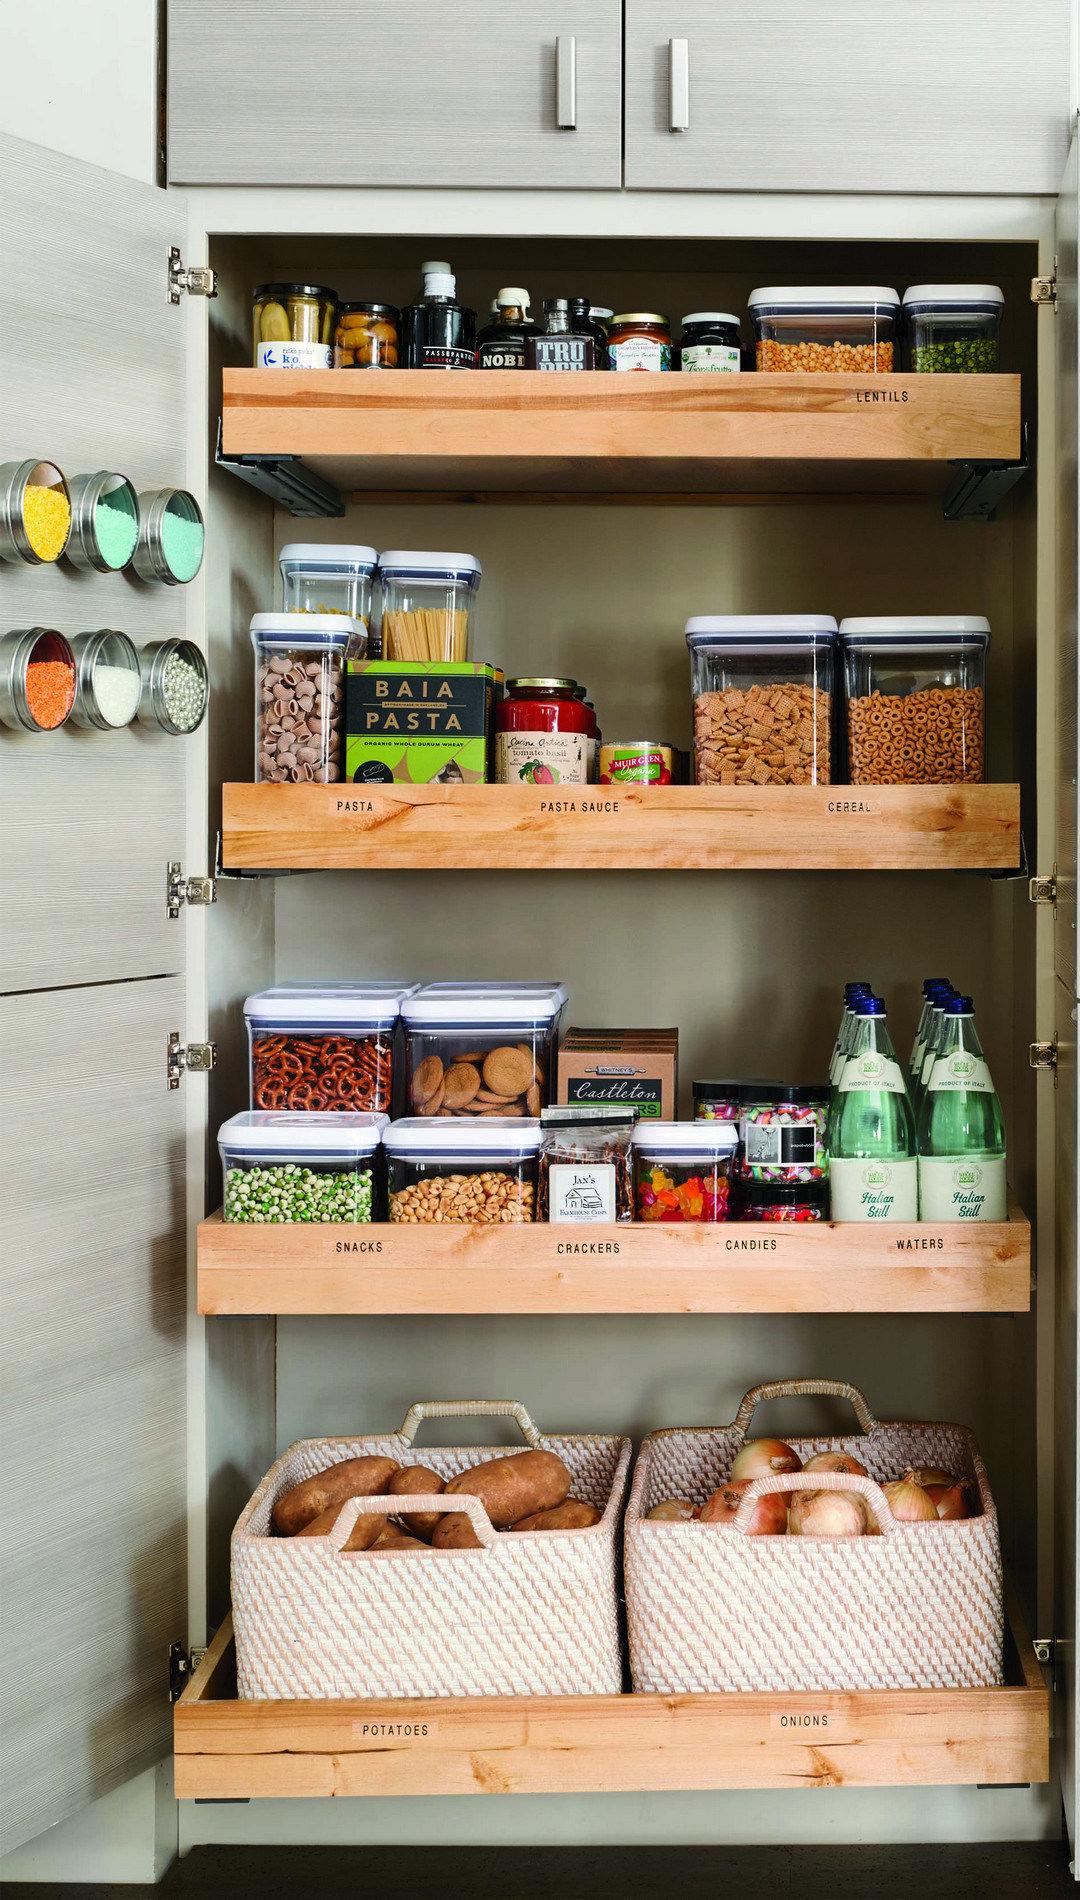 20 Diy Small Kitchen Storage Ideas 1 Small Kitchen Storage Small Pantry Kitchen Design Small